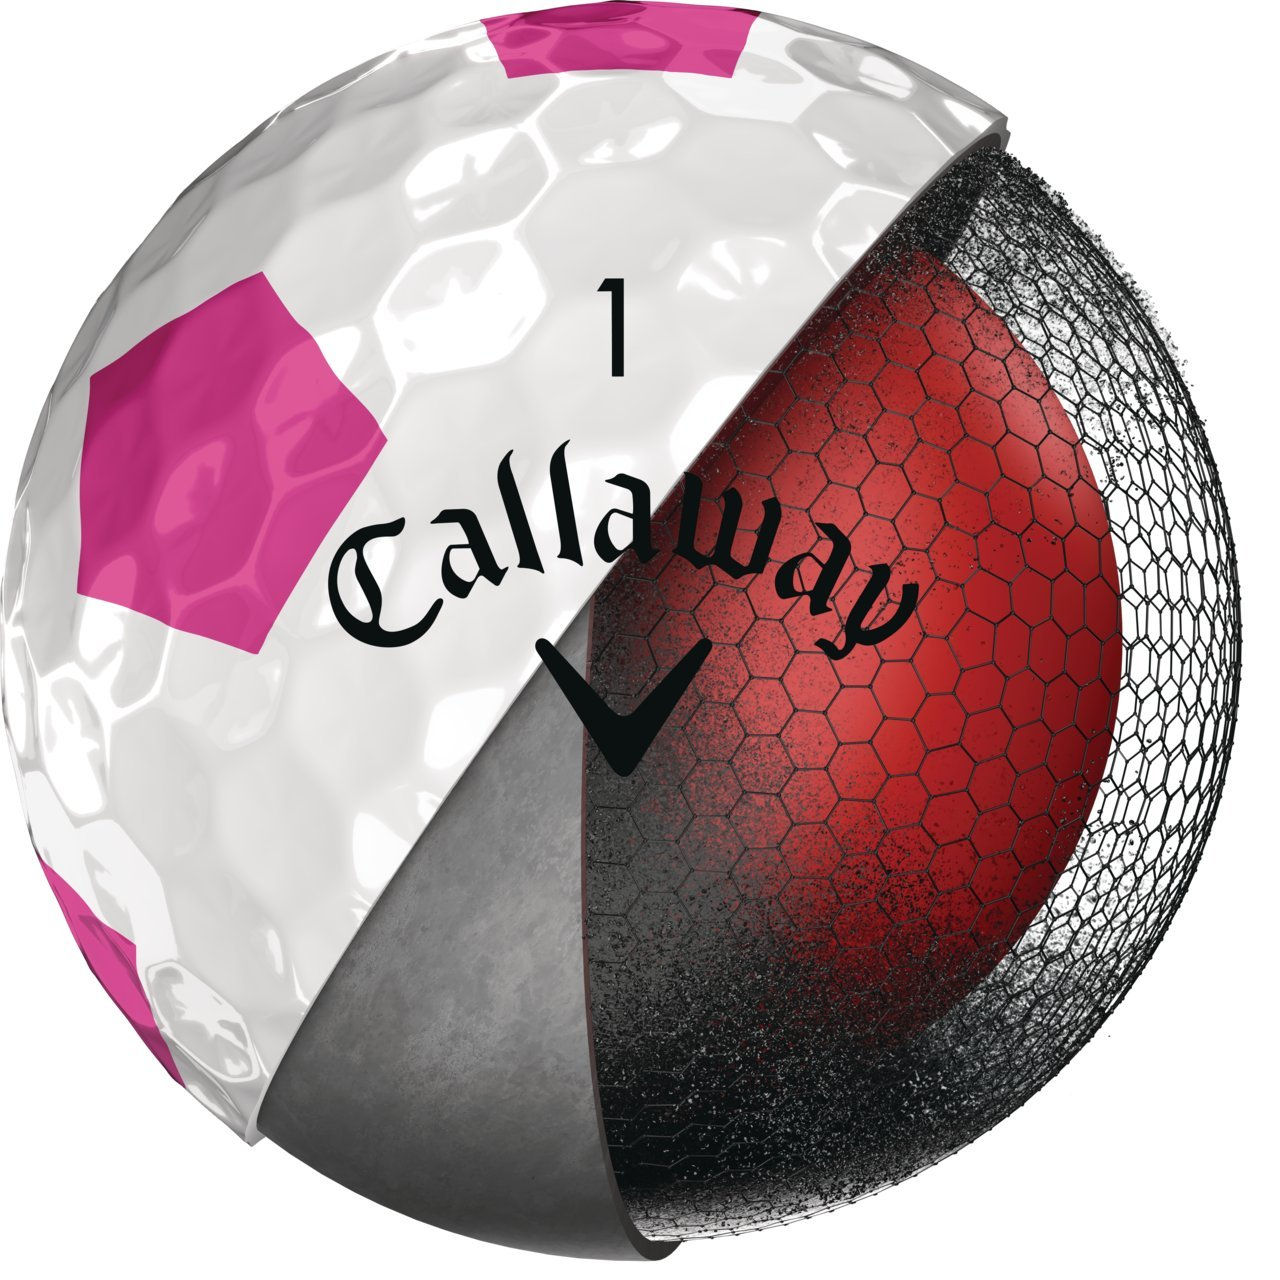 Callaway 2018 Chrome Soft Golf Balls, Truvis Pink by Callaway (Image #2)